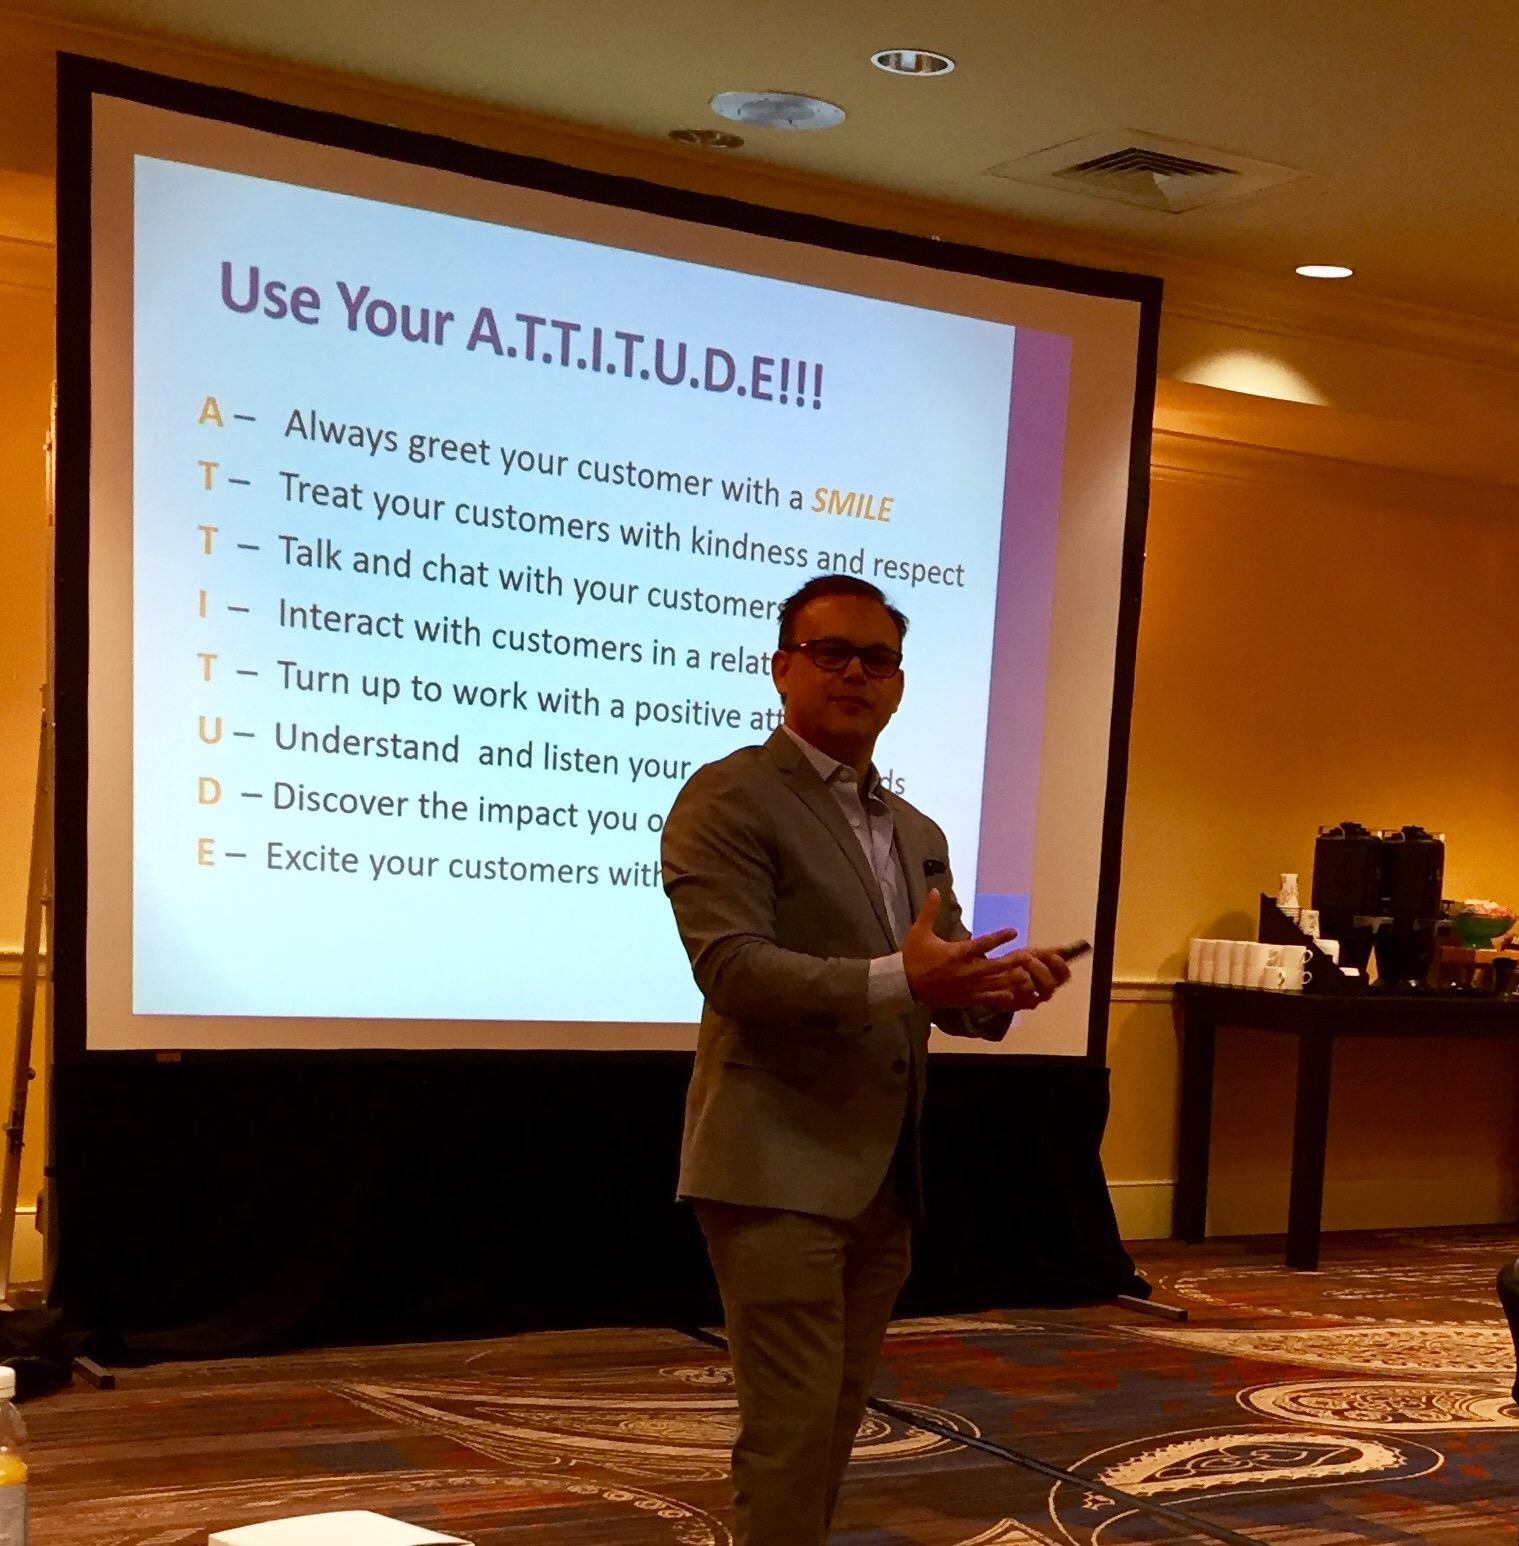 Customer Service Training by Customer Service Trainer Ryan Lowe